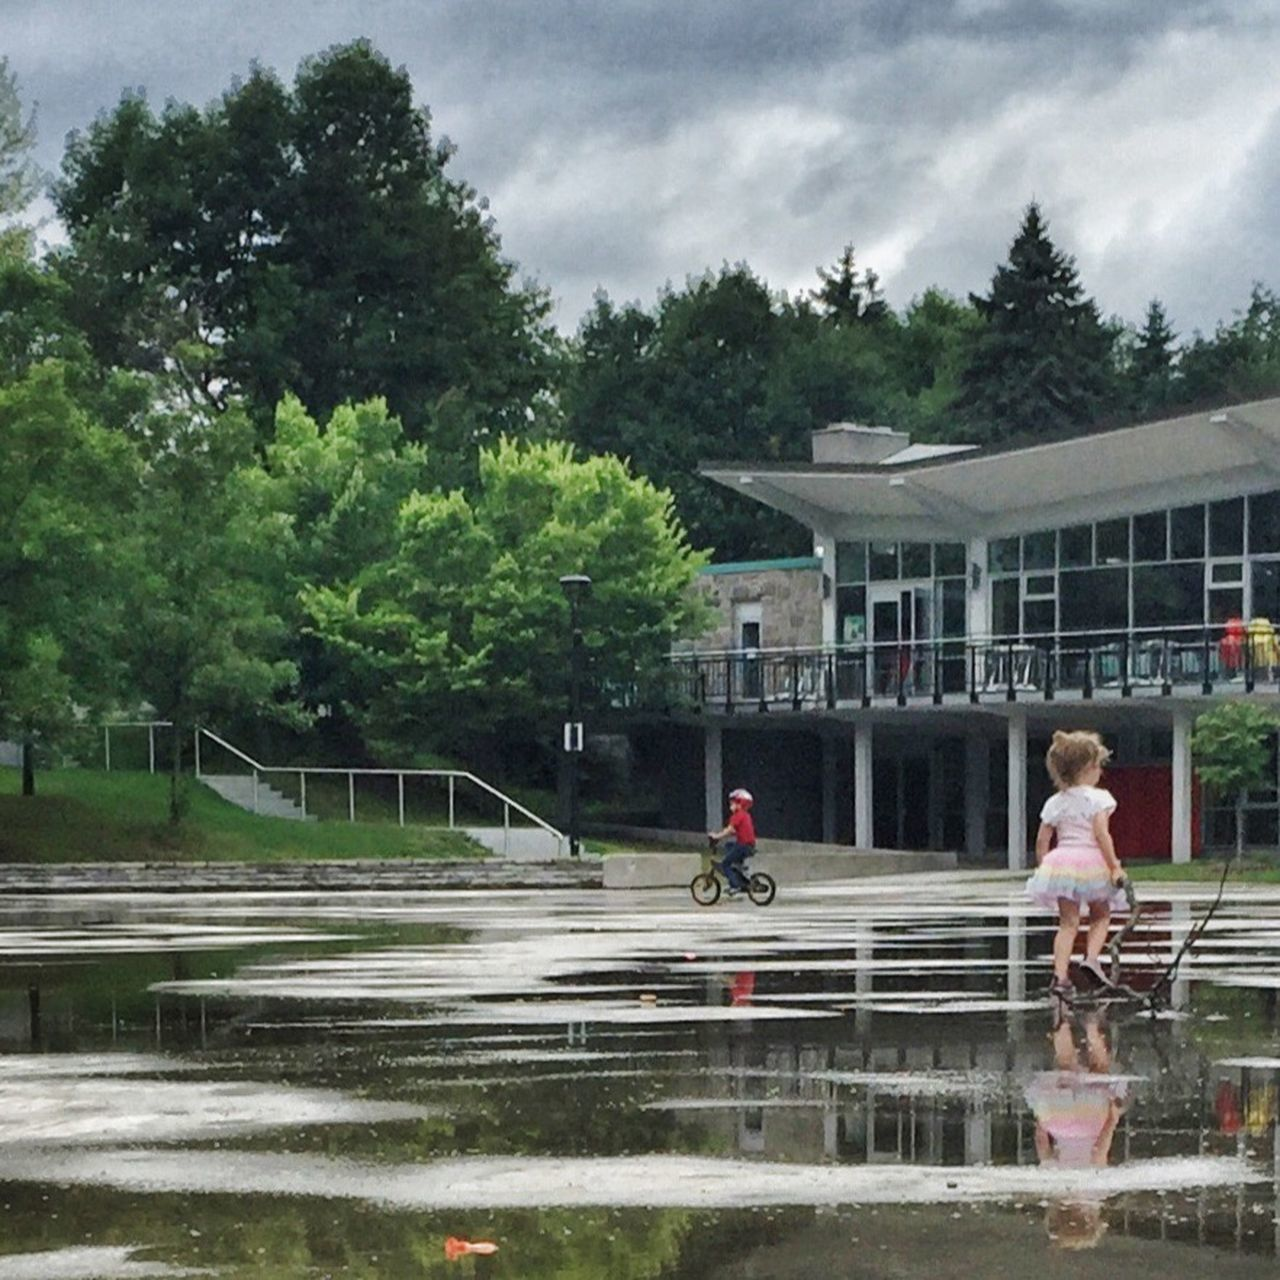 After the rain Streetphotography Montréal AMPt Community